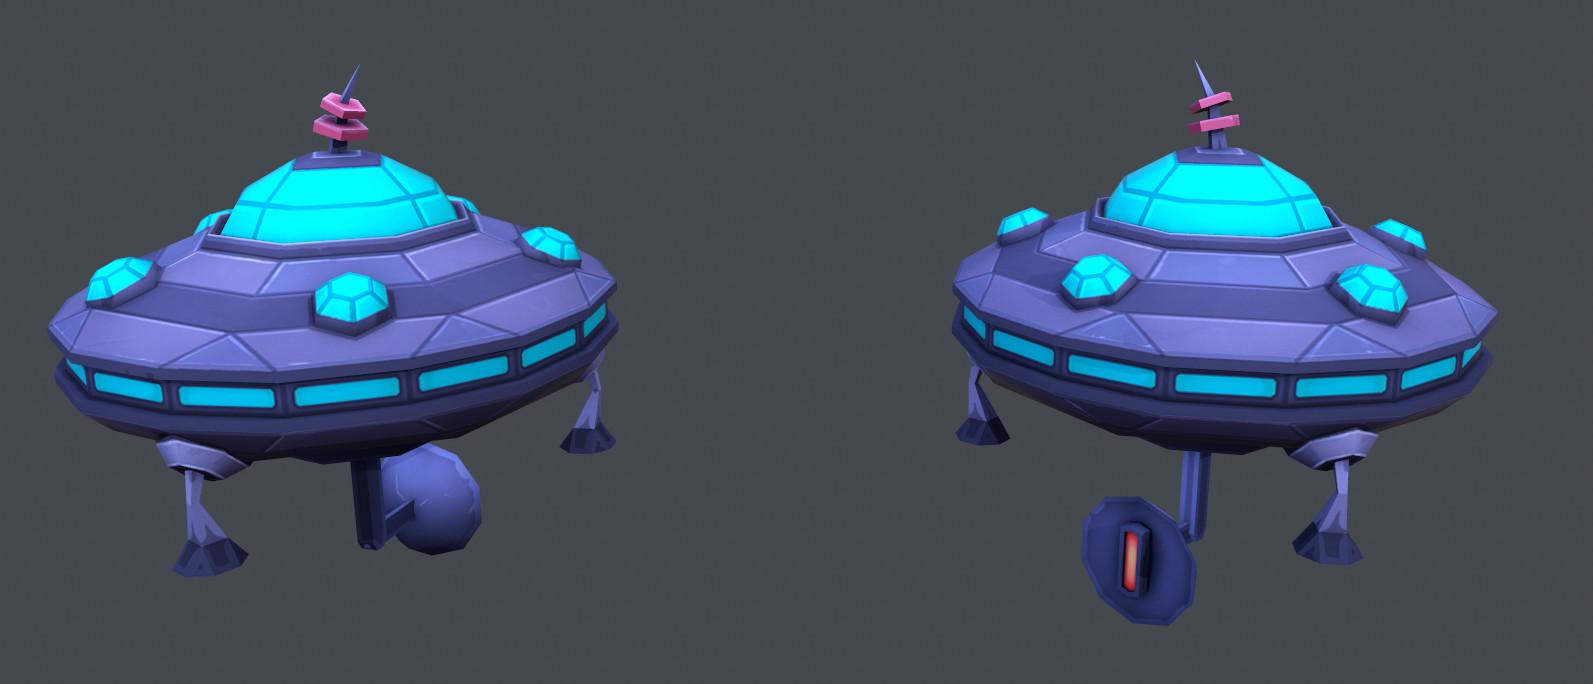 Ufo Character